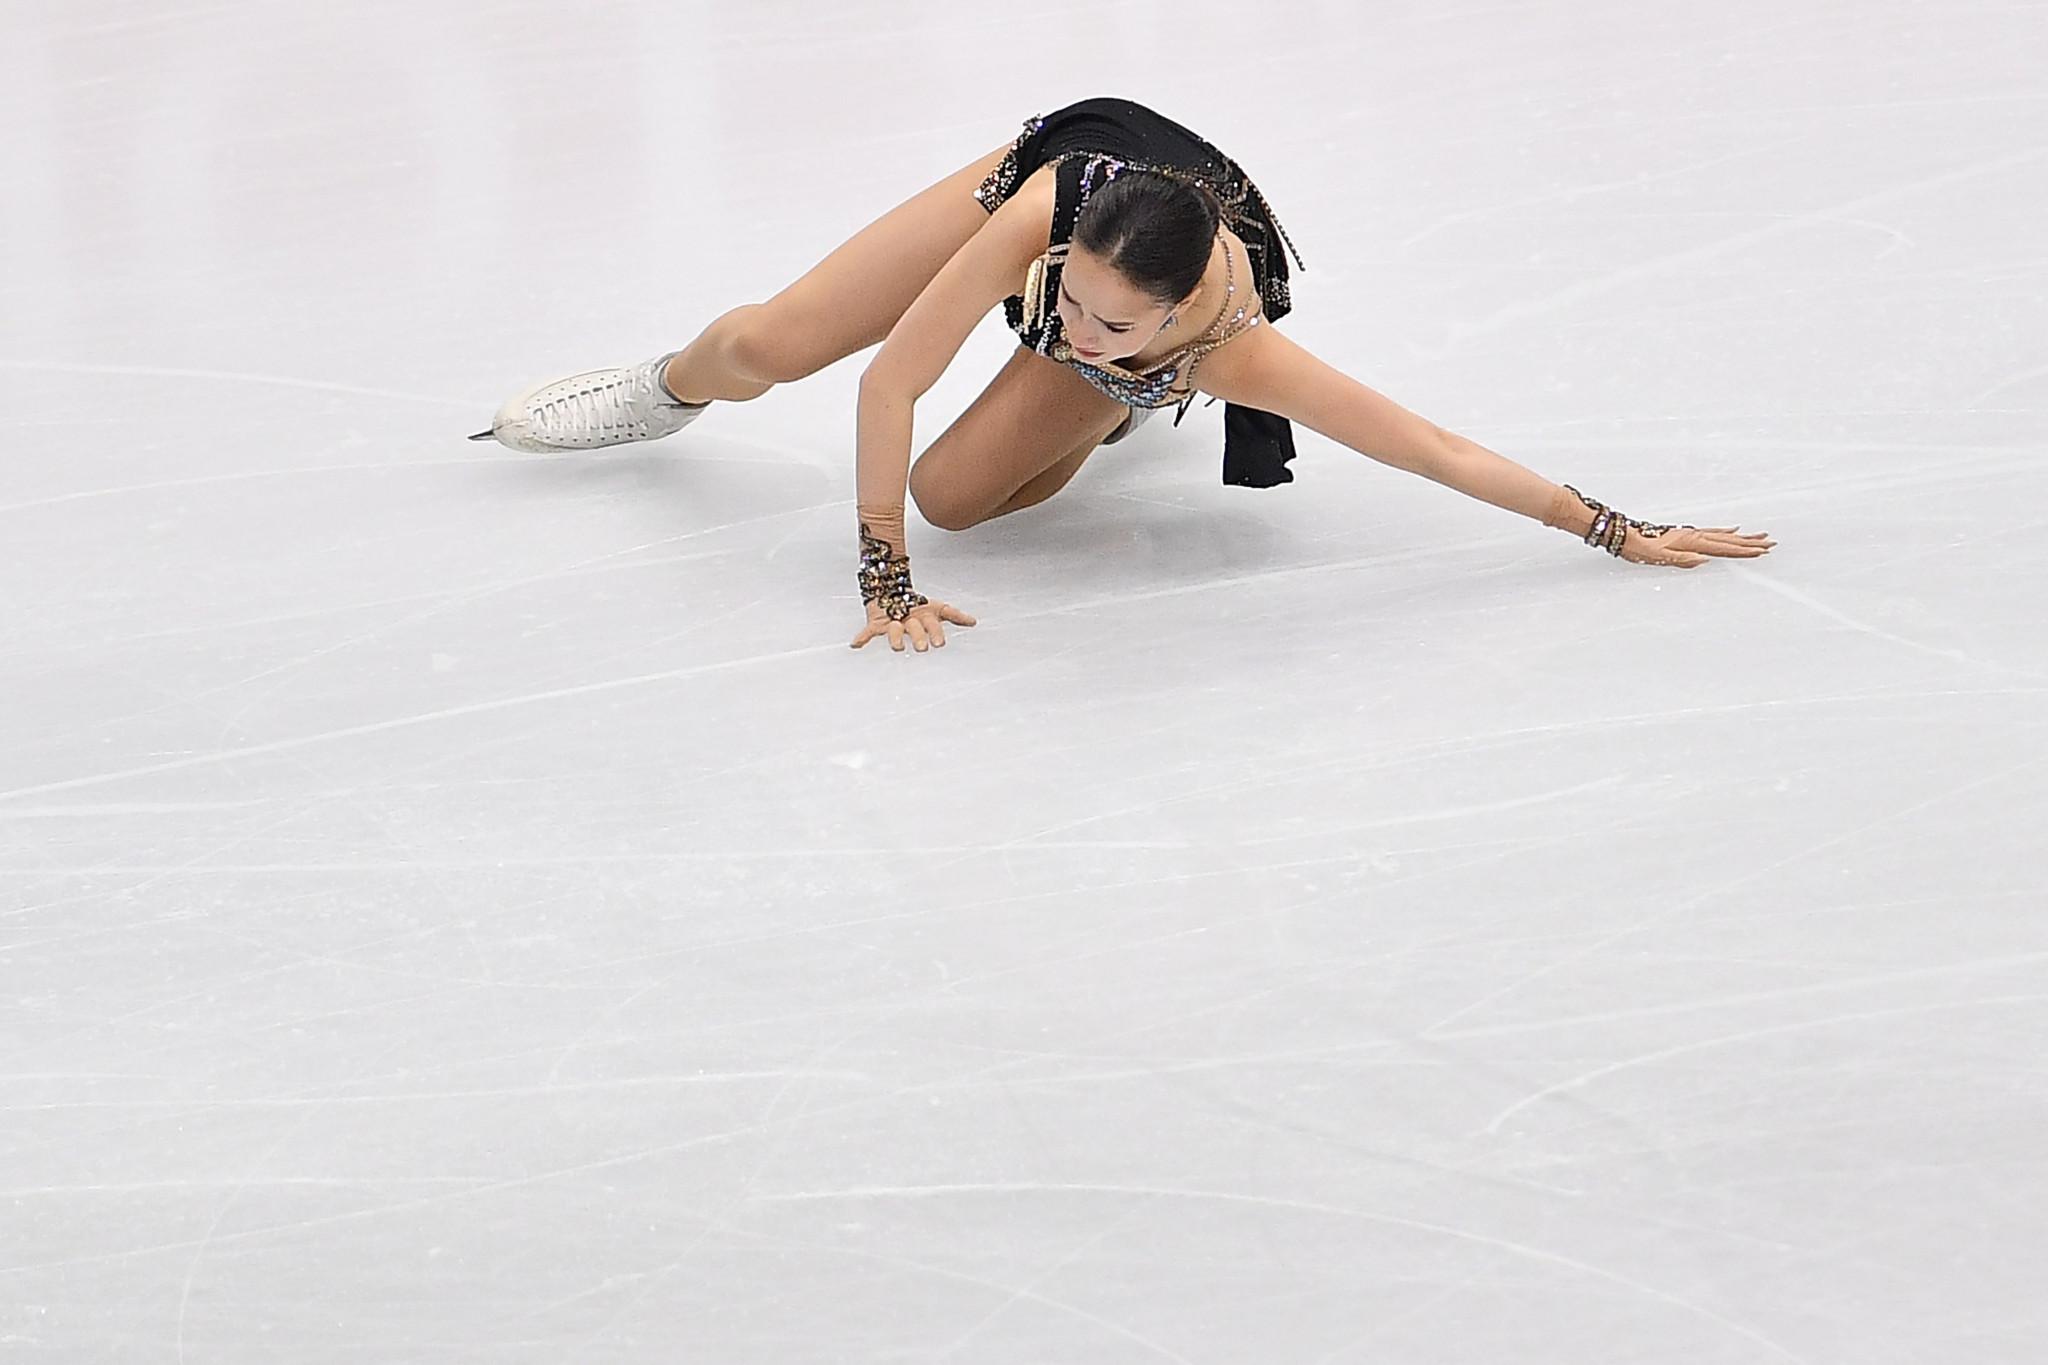 Alina Zagitova struggled during the ISU Grand Prix Final, finishing last ©Getty Images